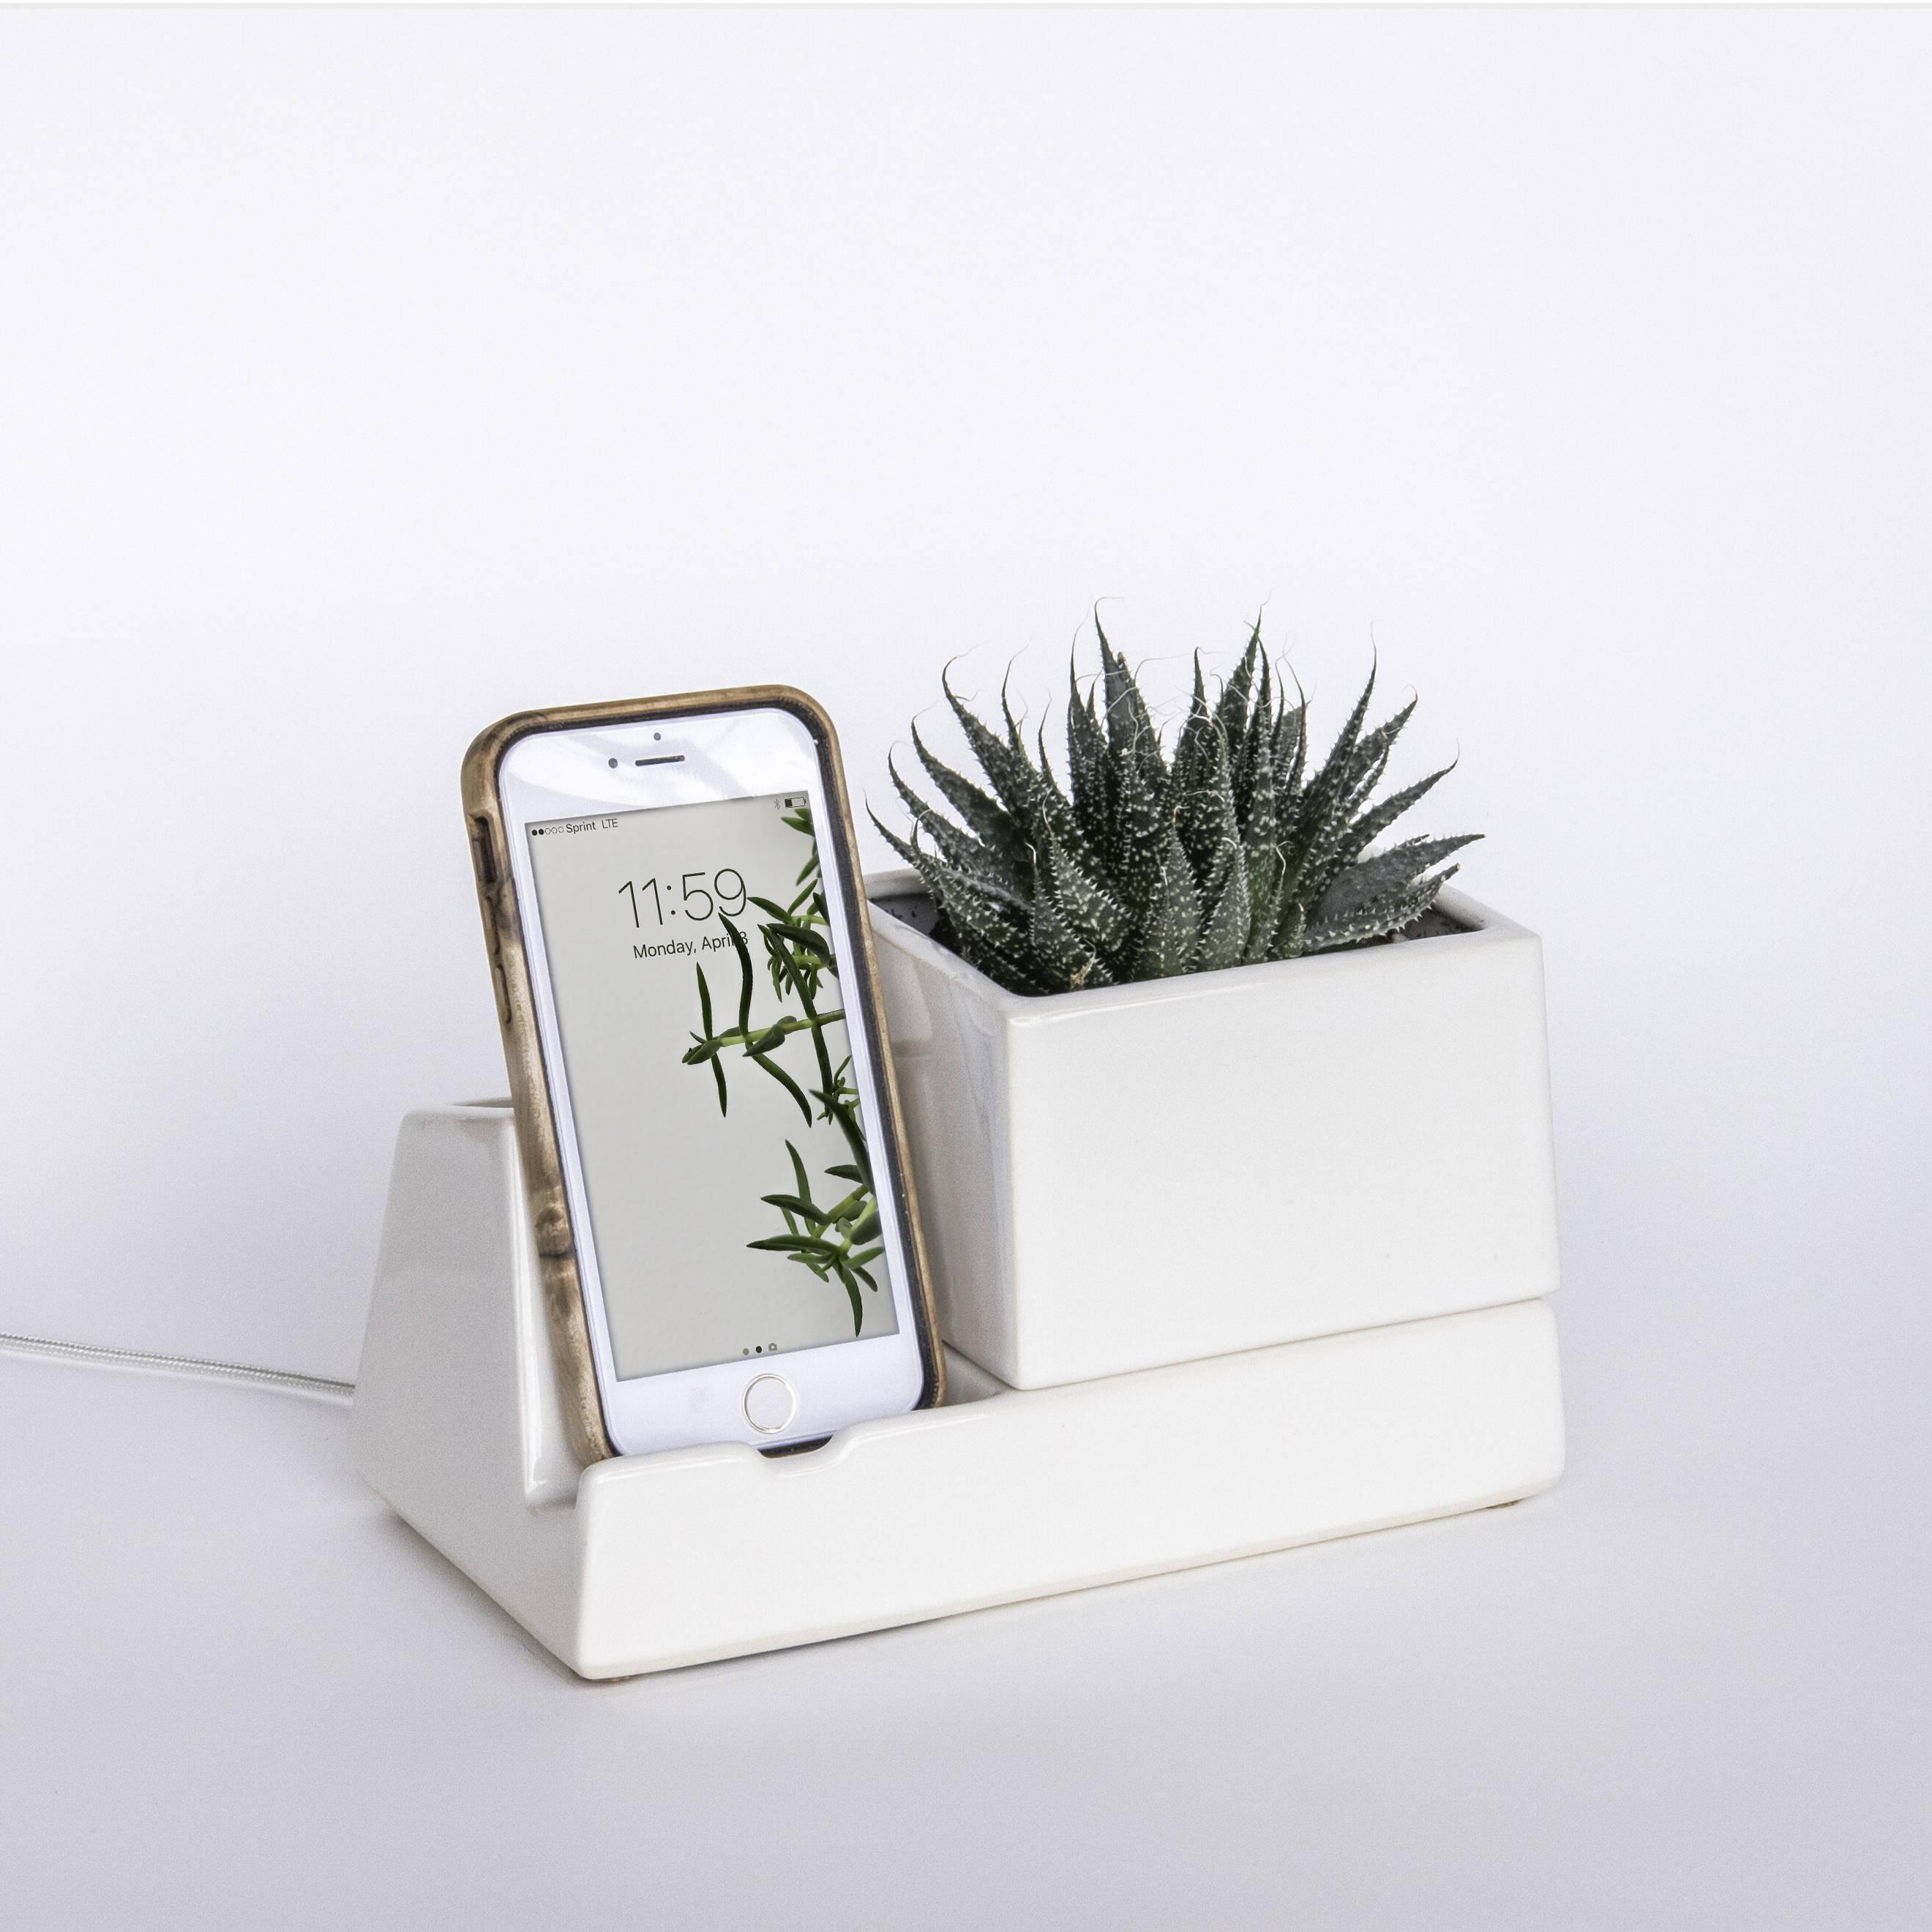 iphone planter